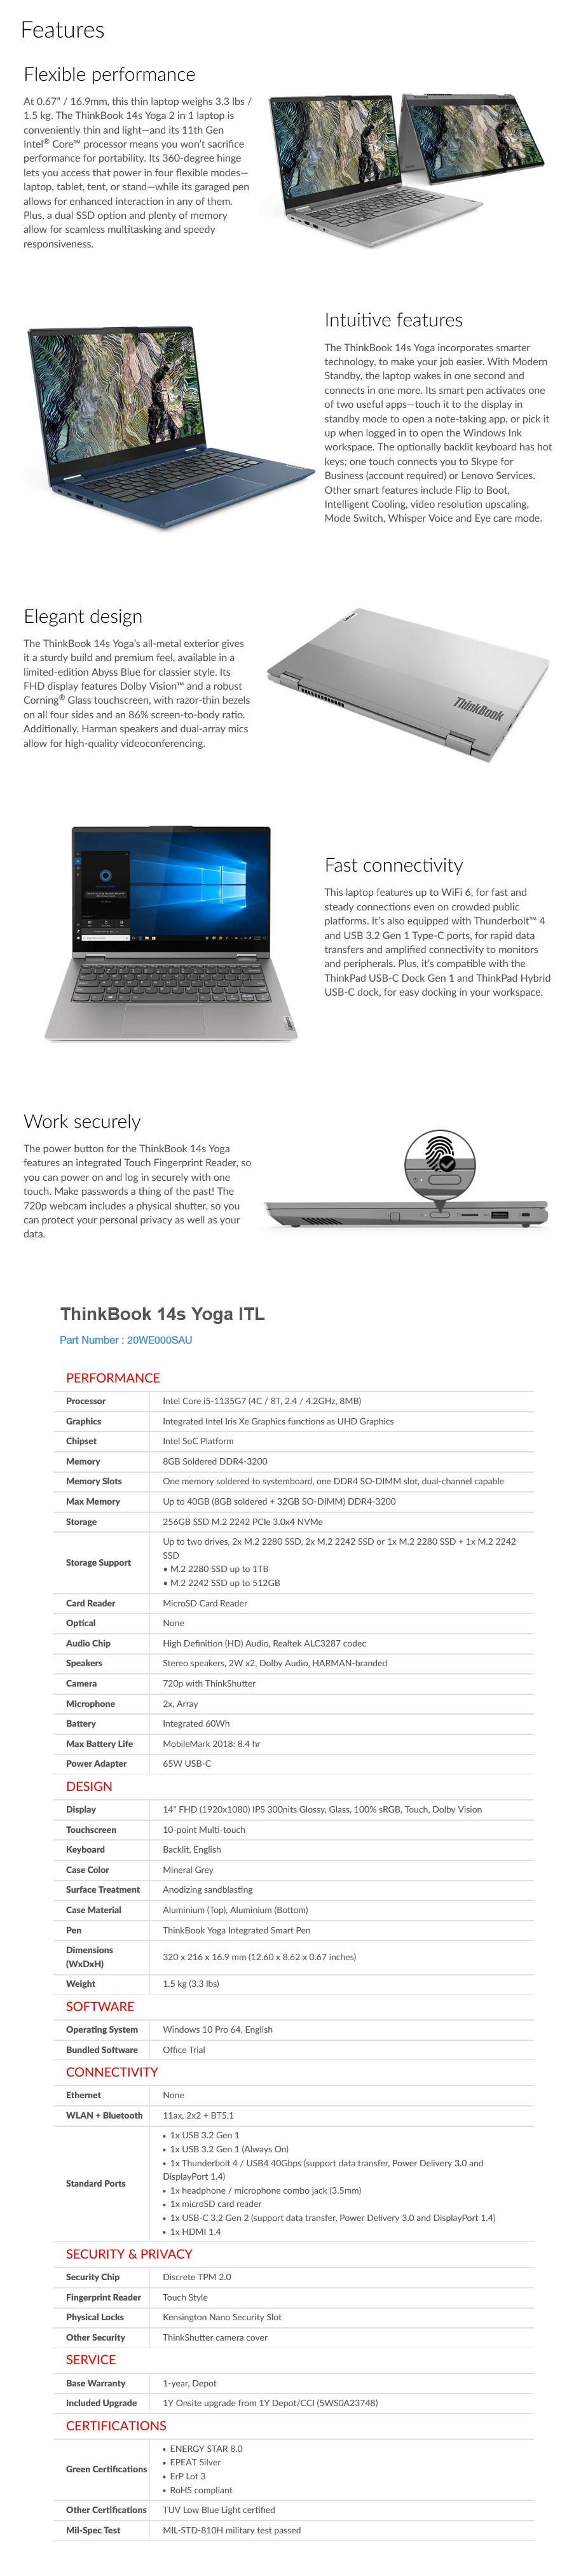 lenovo-thinkbook-14s-yoga-itl-14-2in1-laptop-i51135g7-8gb-256gb-w10p-touch-ac44113-5.jpg